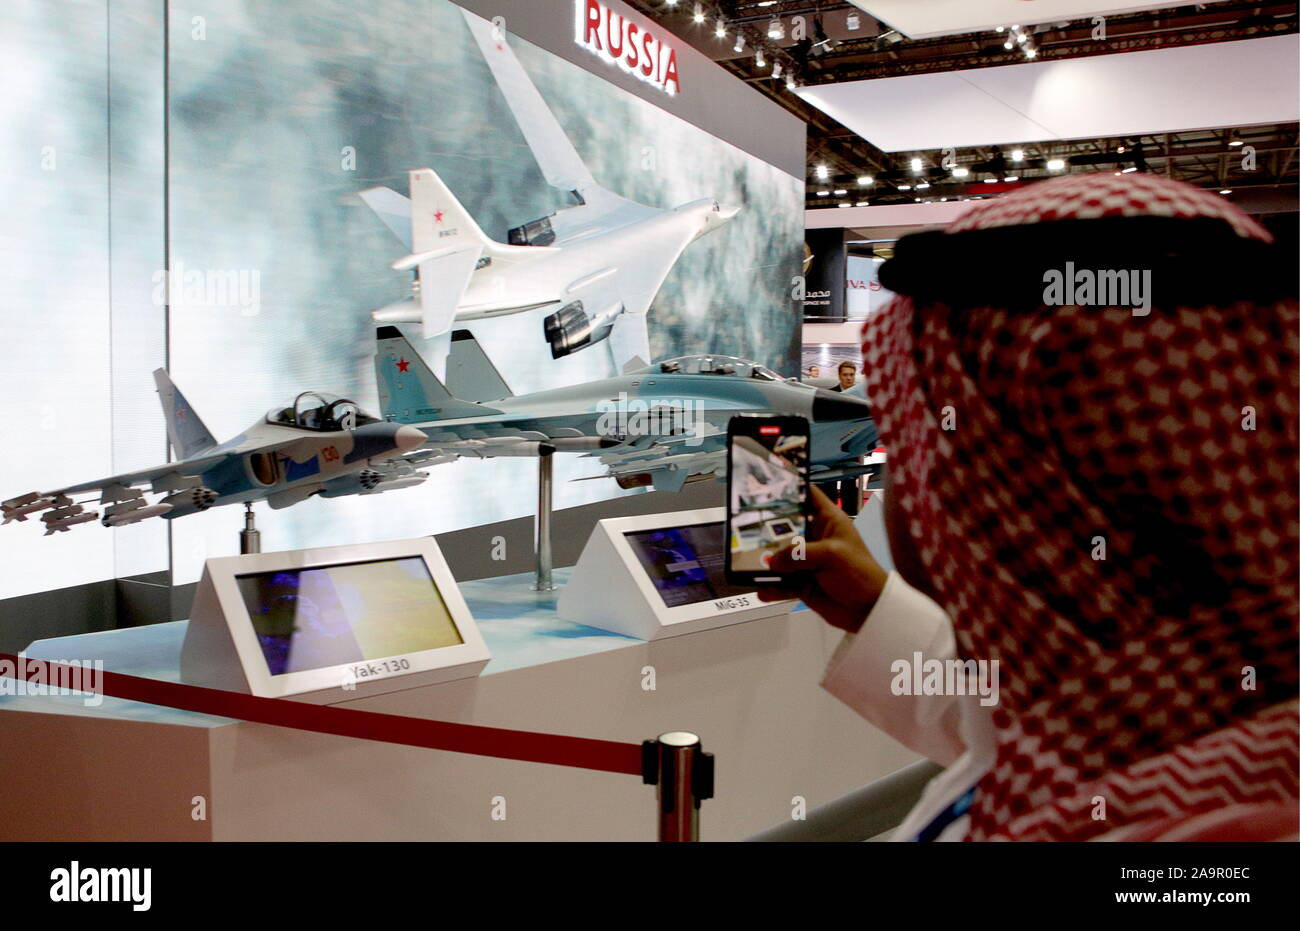 Dubai, United Arab Emirates. 17th Nov, 2019. DUBAI, UNITED ARAB EMIRATES - NOVEMBER 17, 2019: The United Aircraft Corporation stand at the 2019 Dubai Airshow. Marina Lystseva/TASS Credit: ITAR-TASS News Agency/Alamy Live News Stock Photo